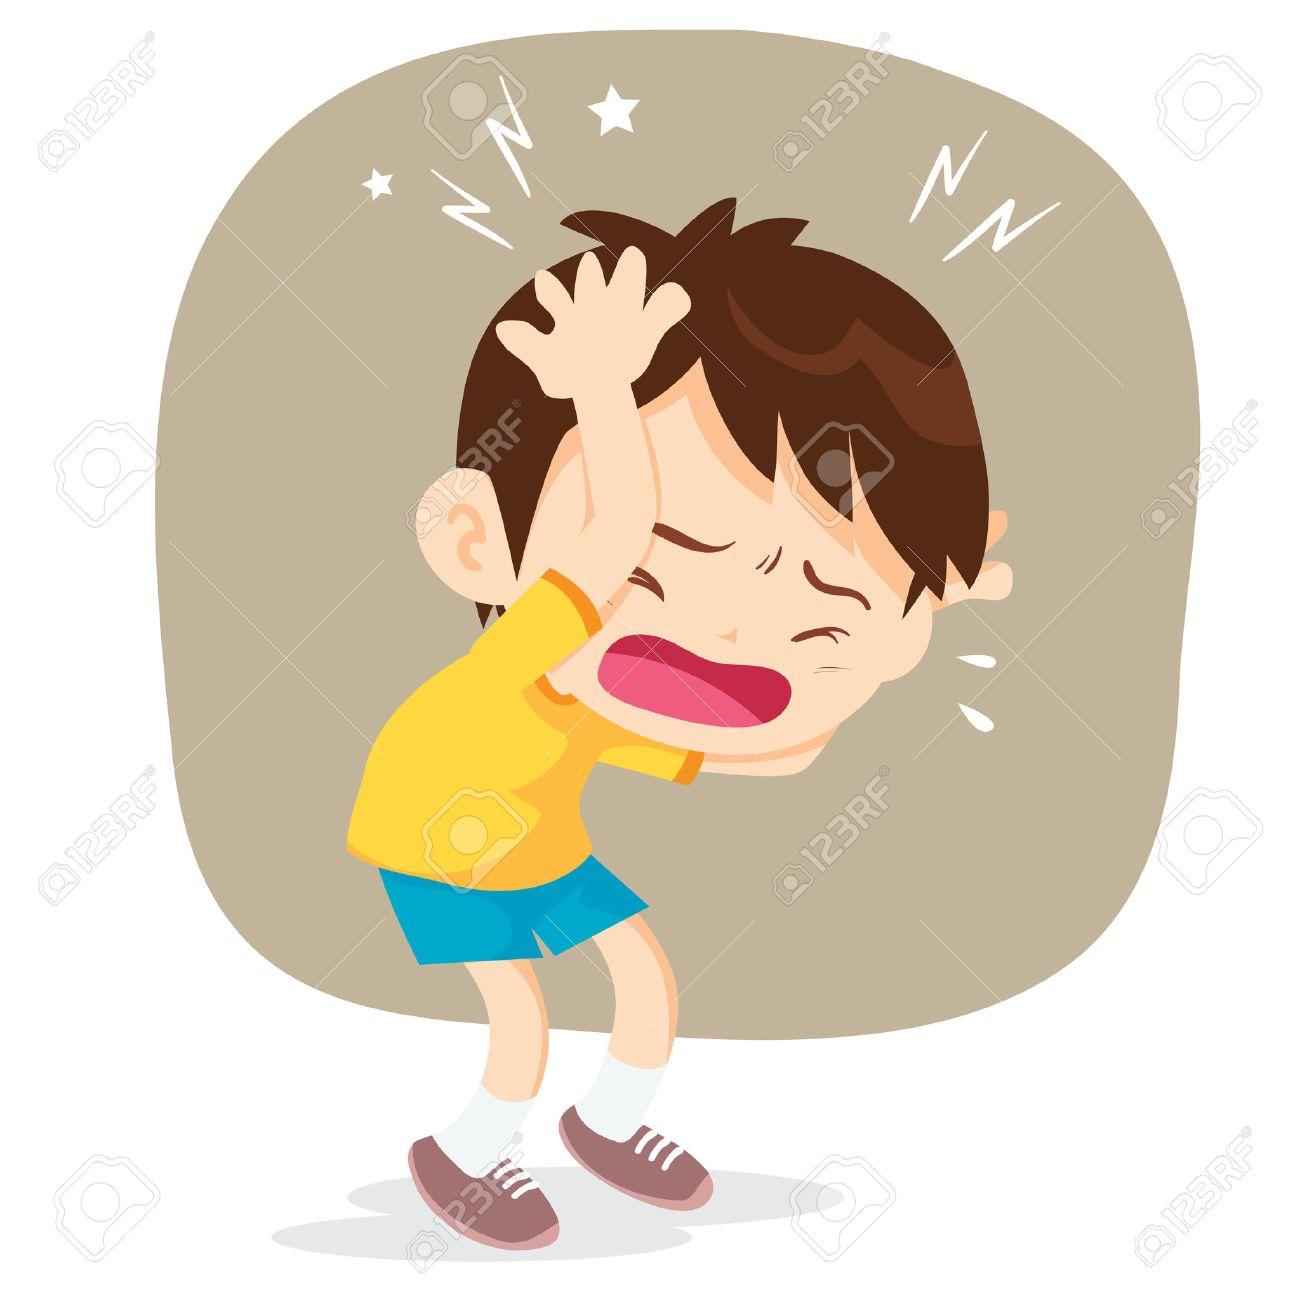 Boy Have Headache Headache Pain Cartoon Vector Illustrator Royalty Free Cliparts Vectors And Stock Illustration Image 66769995